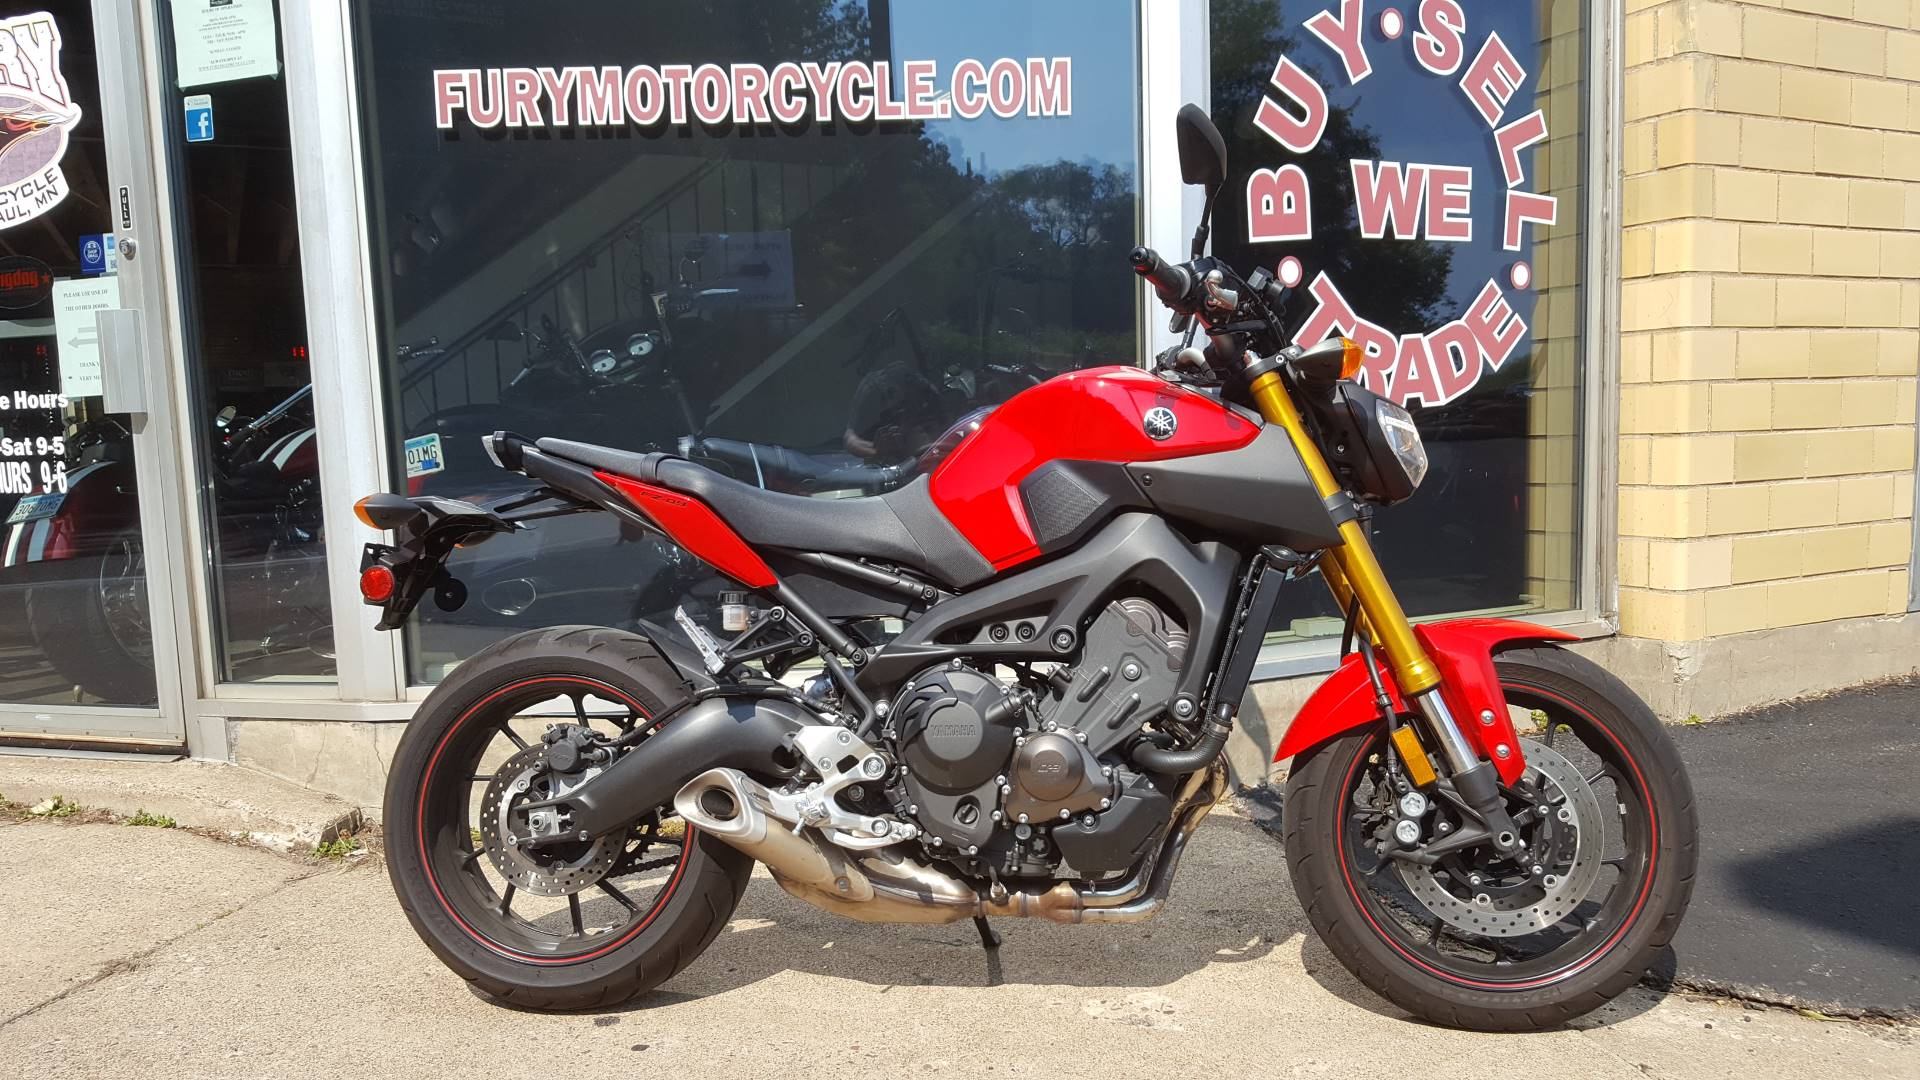 2014 Yamaha FZ-09 for sale 71106